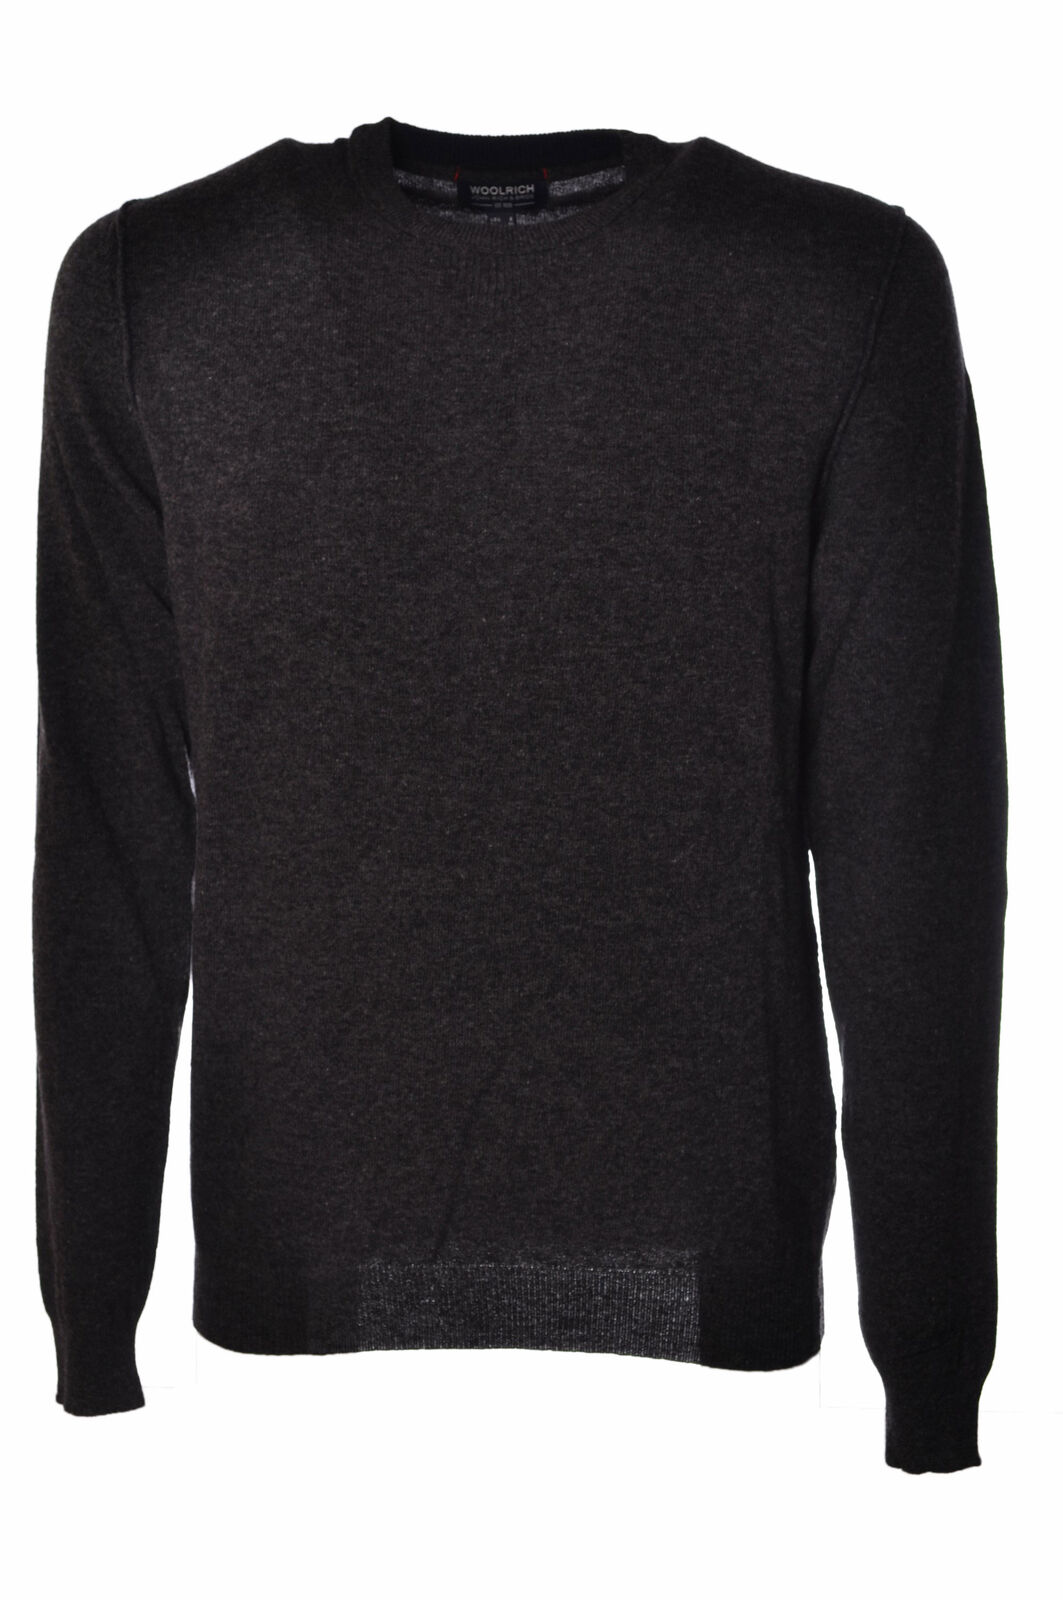 Woolrich  -  Sweaters - Male - Grau - 2638028N173539